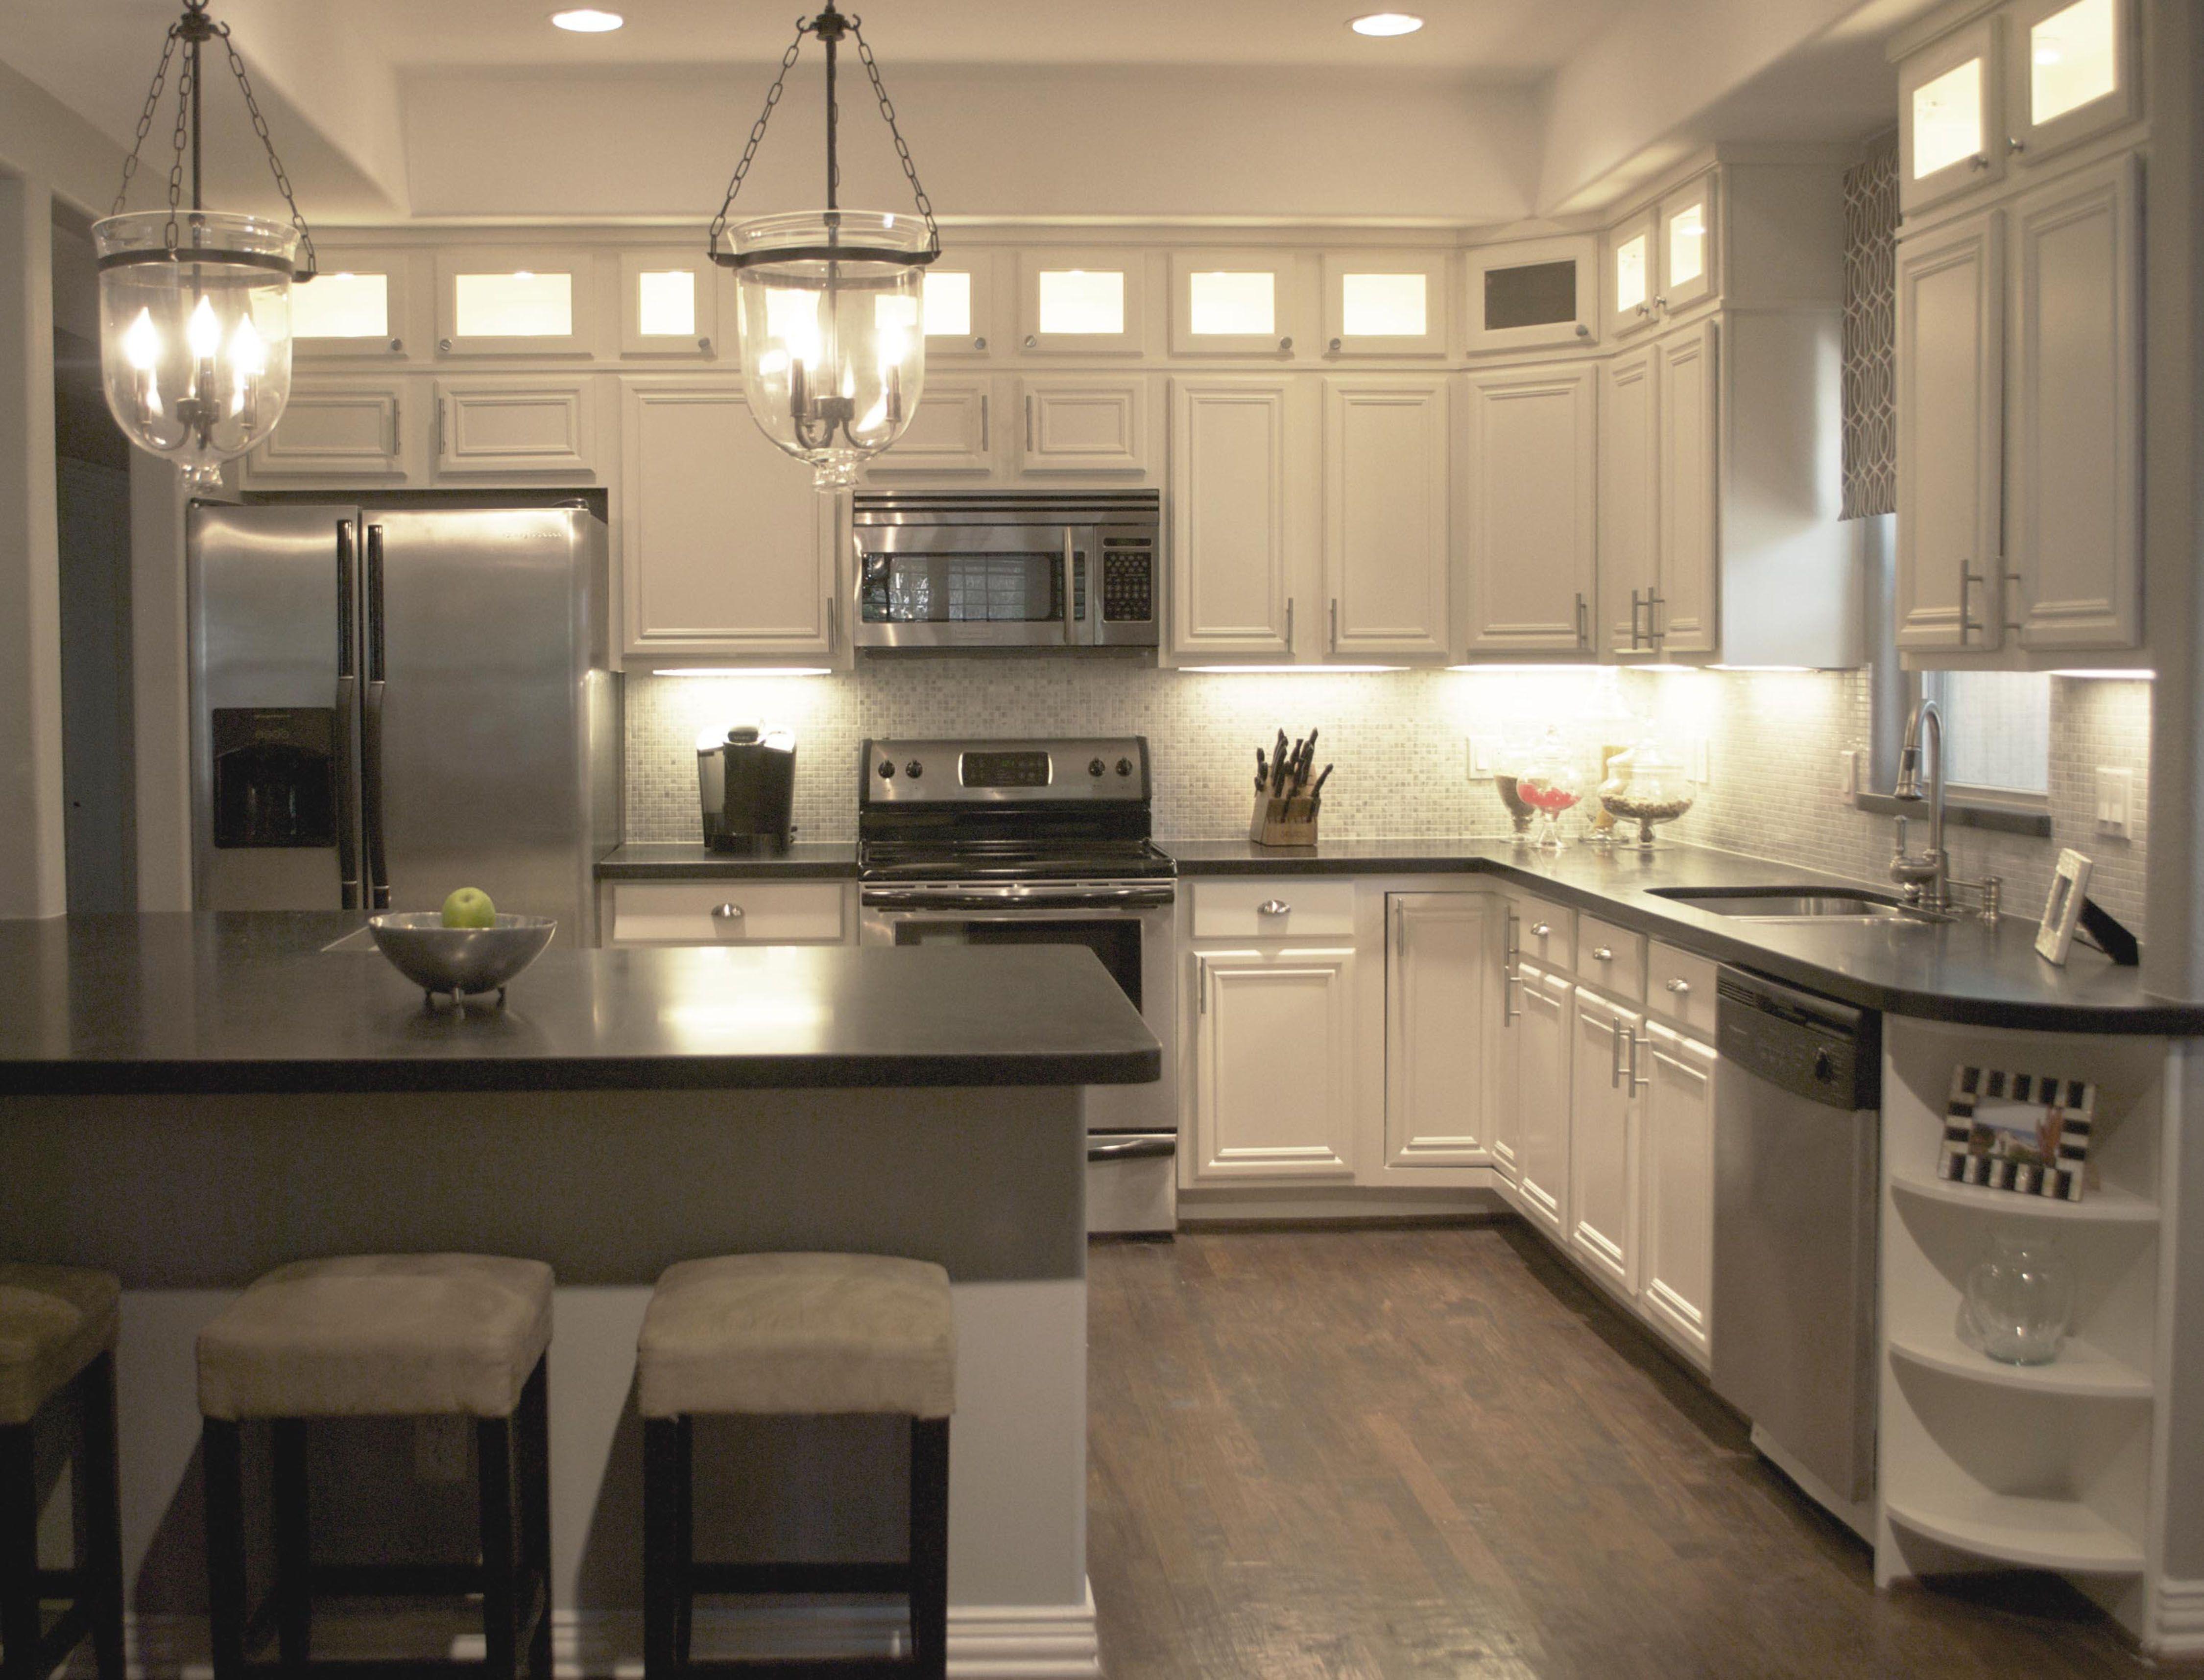 upper cabinet lighting. Attractive How To Remodel A Kitchen #6 - White Under Cabinet Lighting Upper